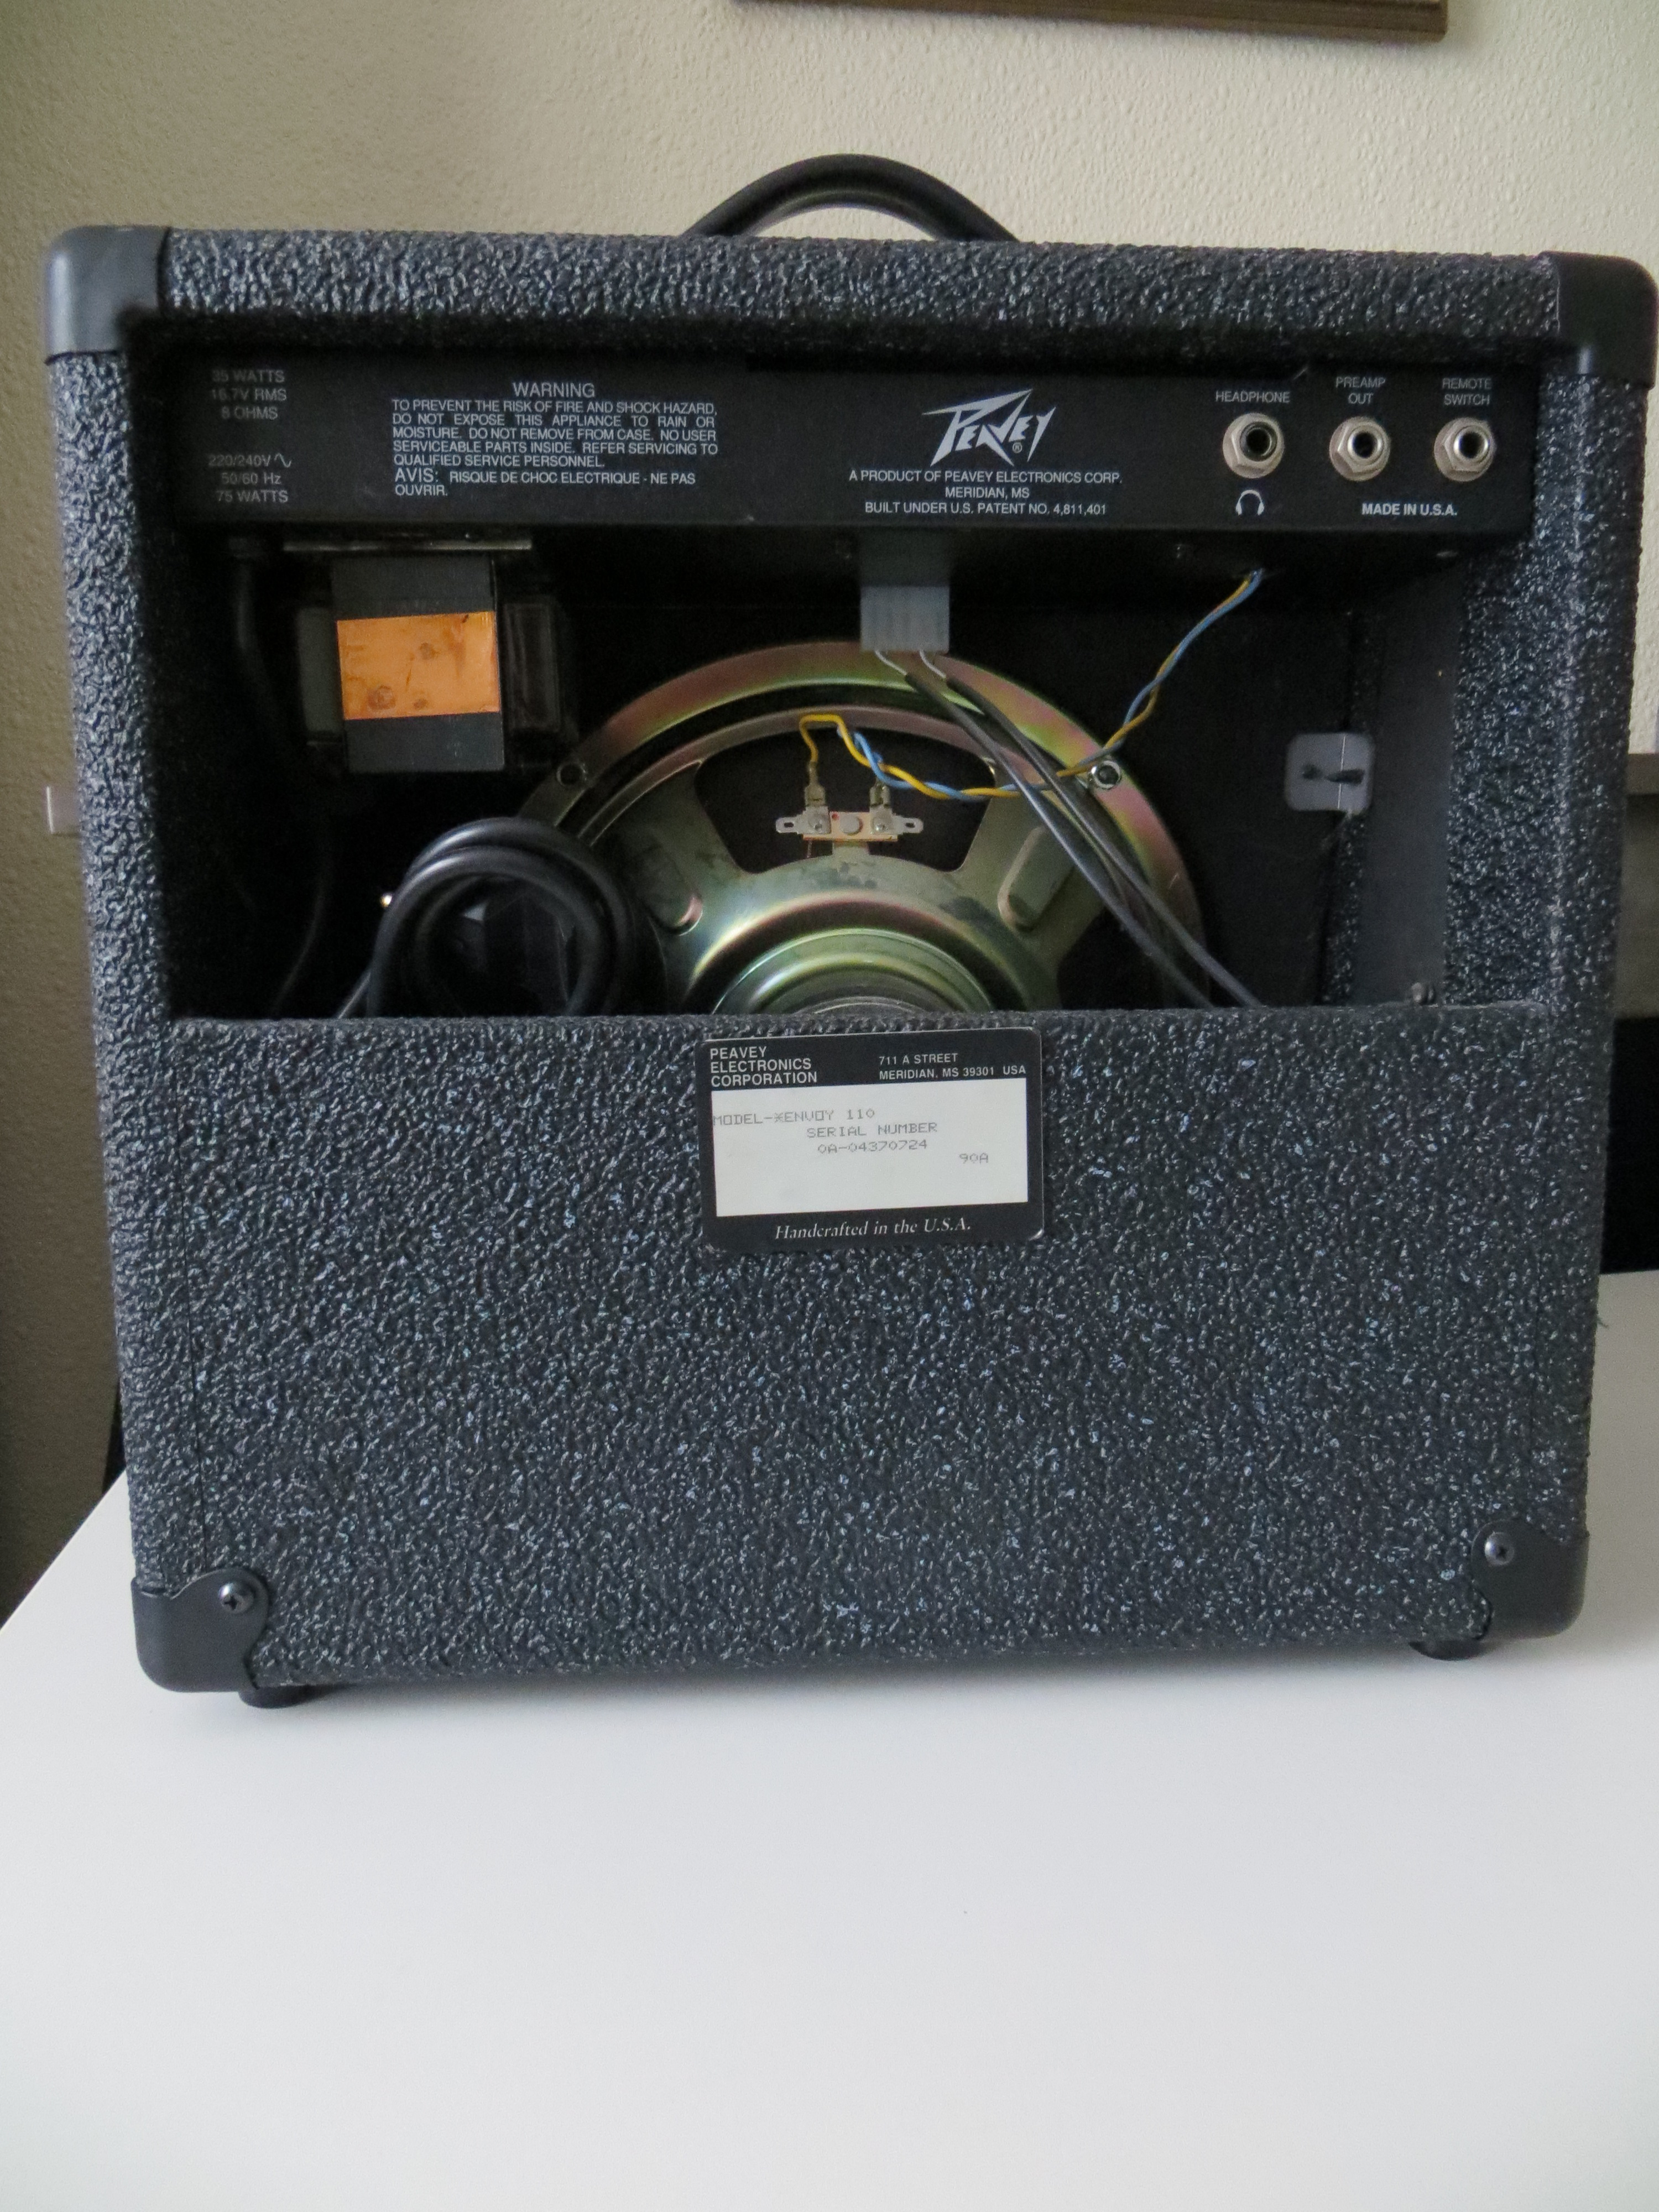 peavey envoy 110 1989 image 1052114 audiofanzine. Black Bedroom Furniture Sets. Home Design Ideas